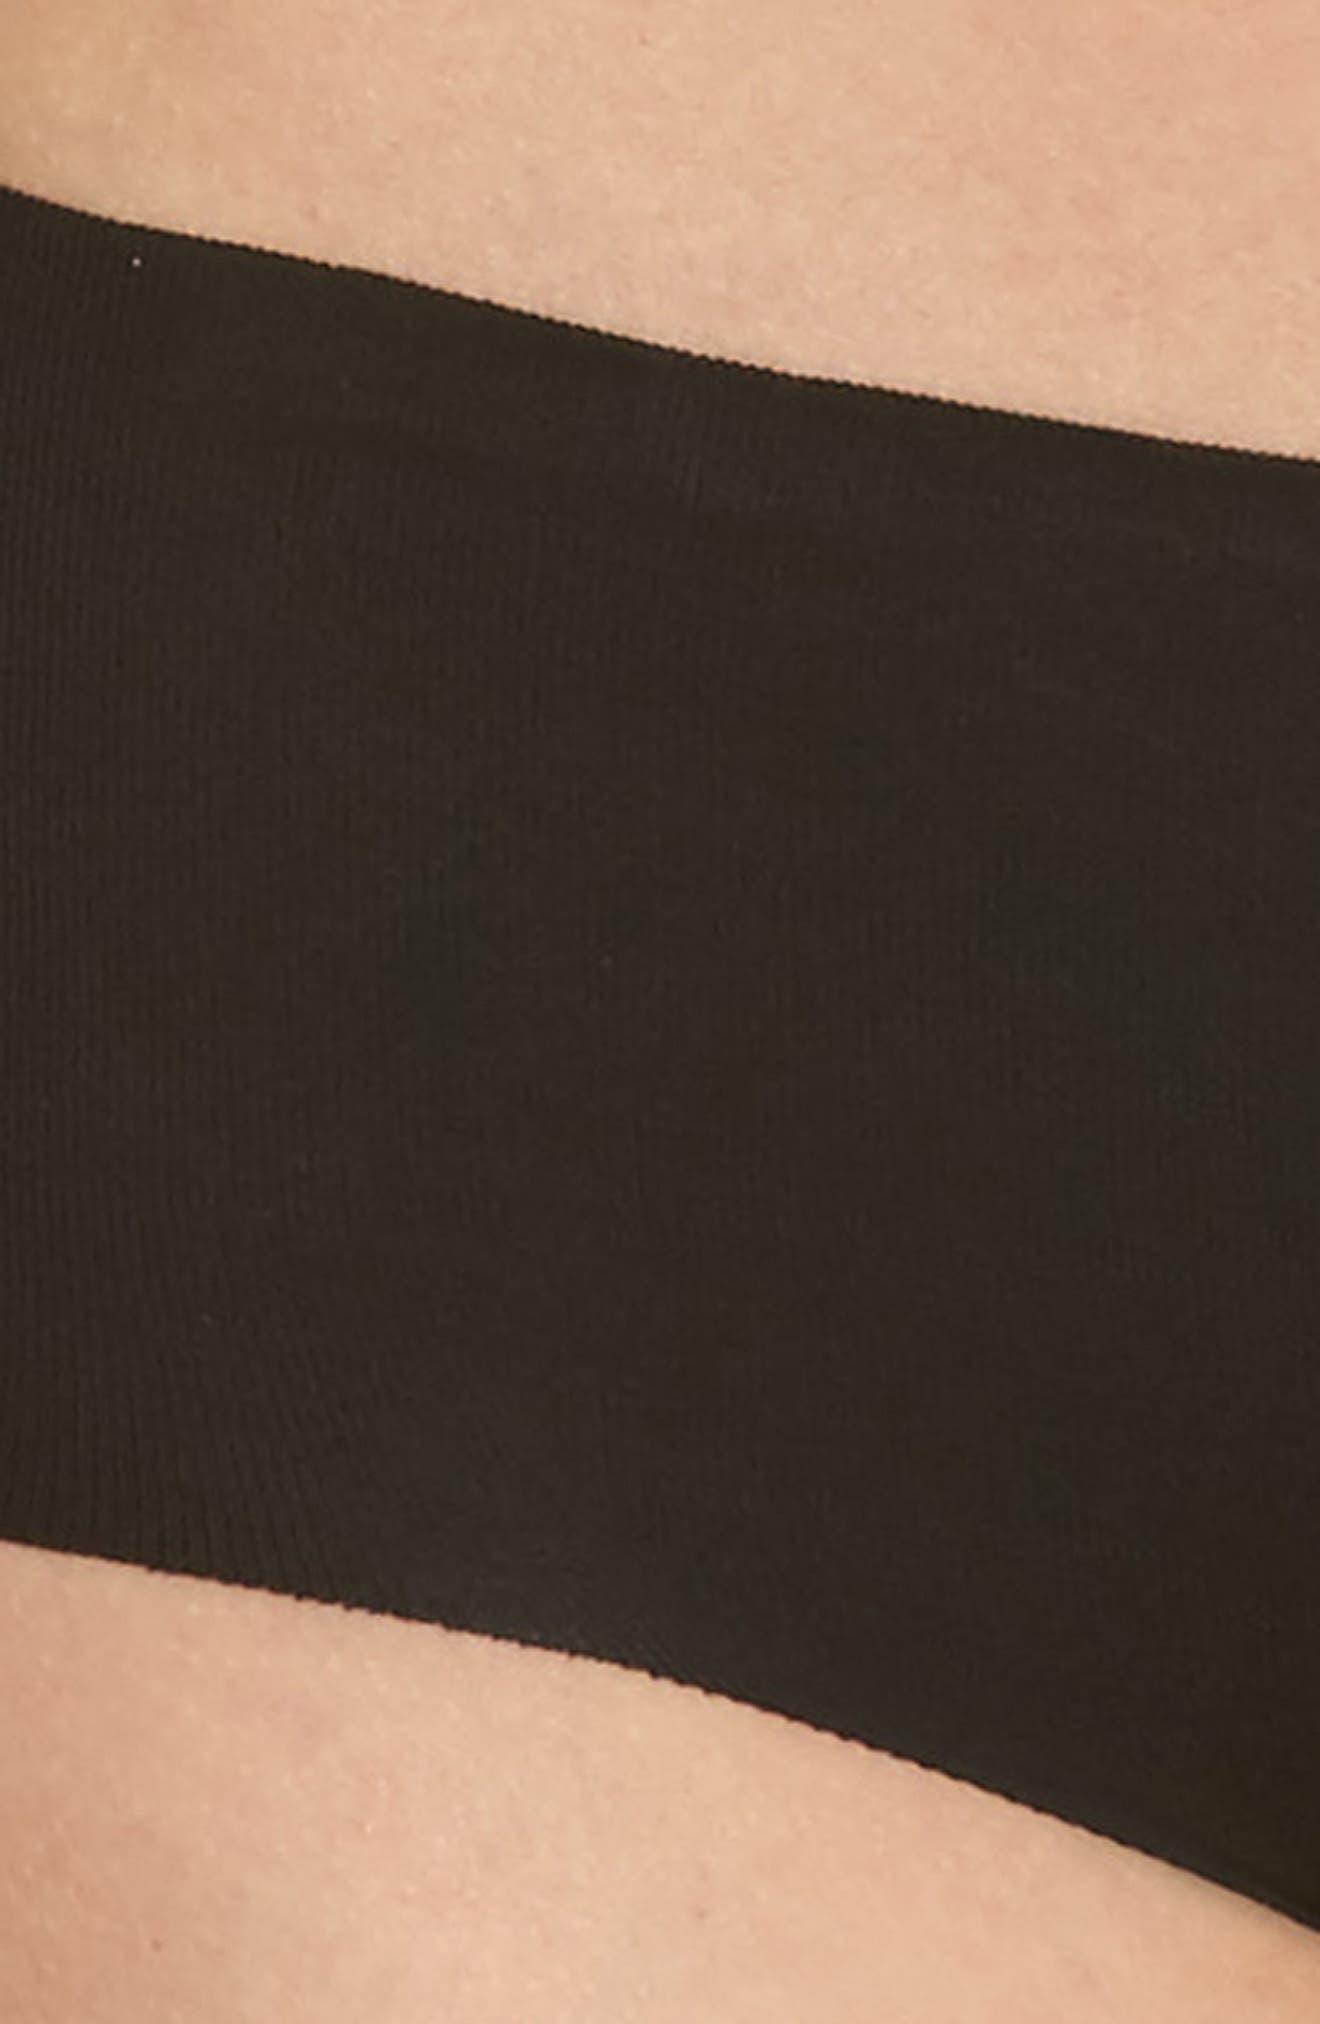 Beyond Naked Hipster Panties,                             Alternate thumbnail 4, color,                             BLACK